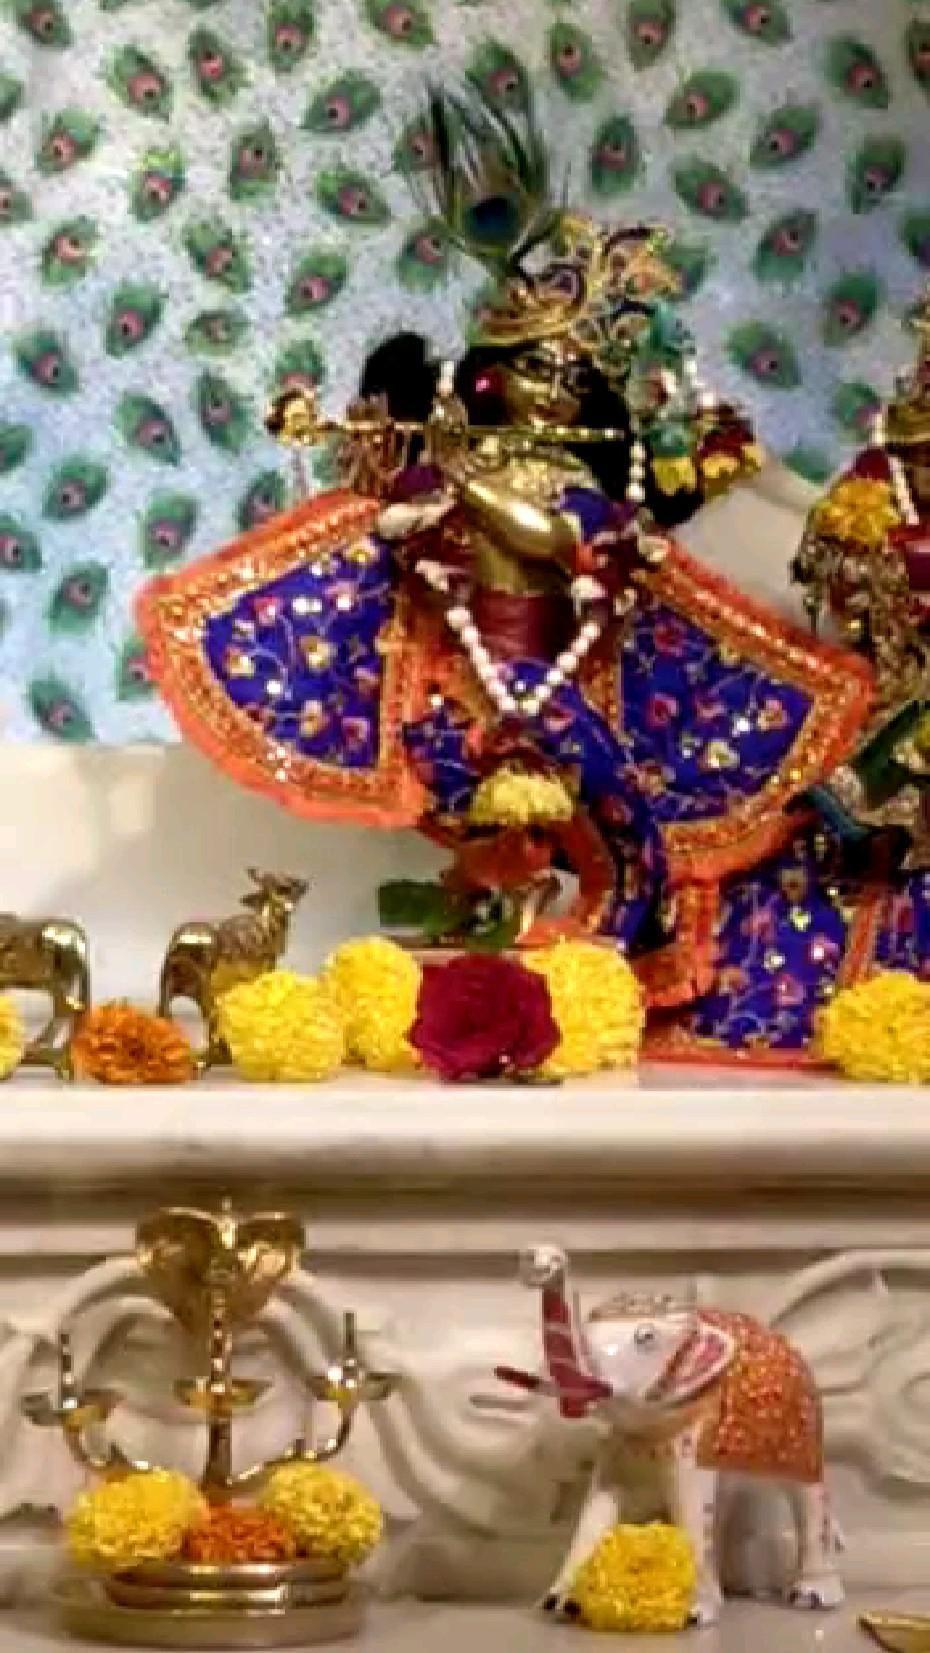 Today's Mangala Aarti Darshan of Sri Sri Radha Madan Mohan J…